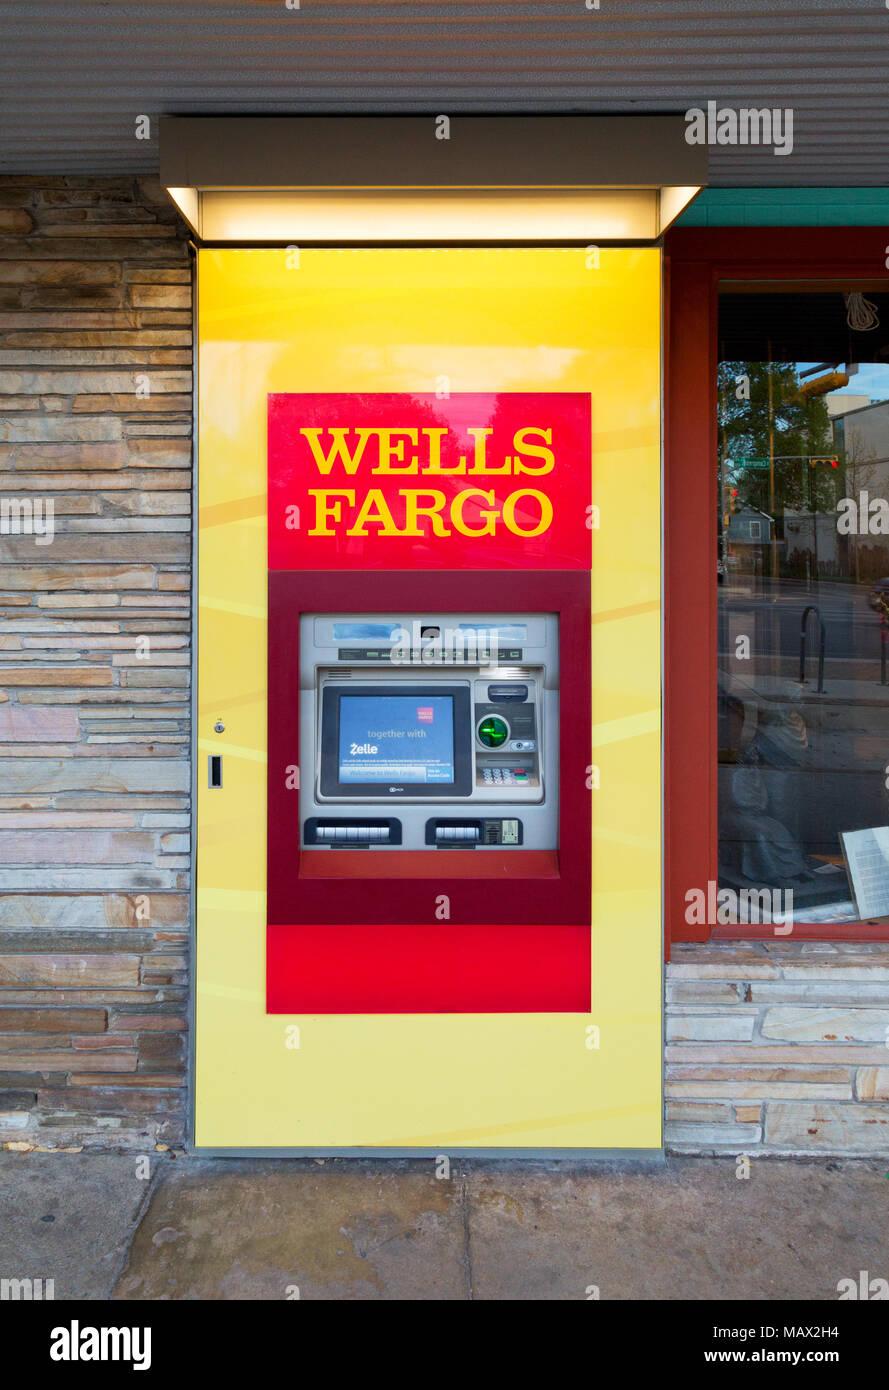 Distributeur de Wells Fargo pour Wells Fargo Bank, New York USA Banque D'Images